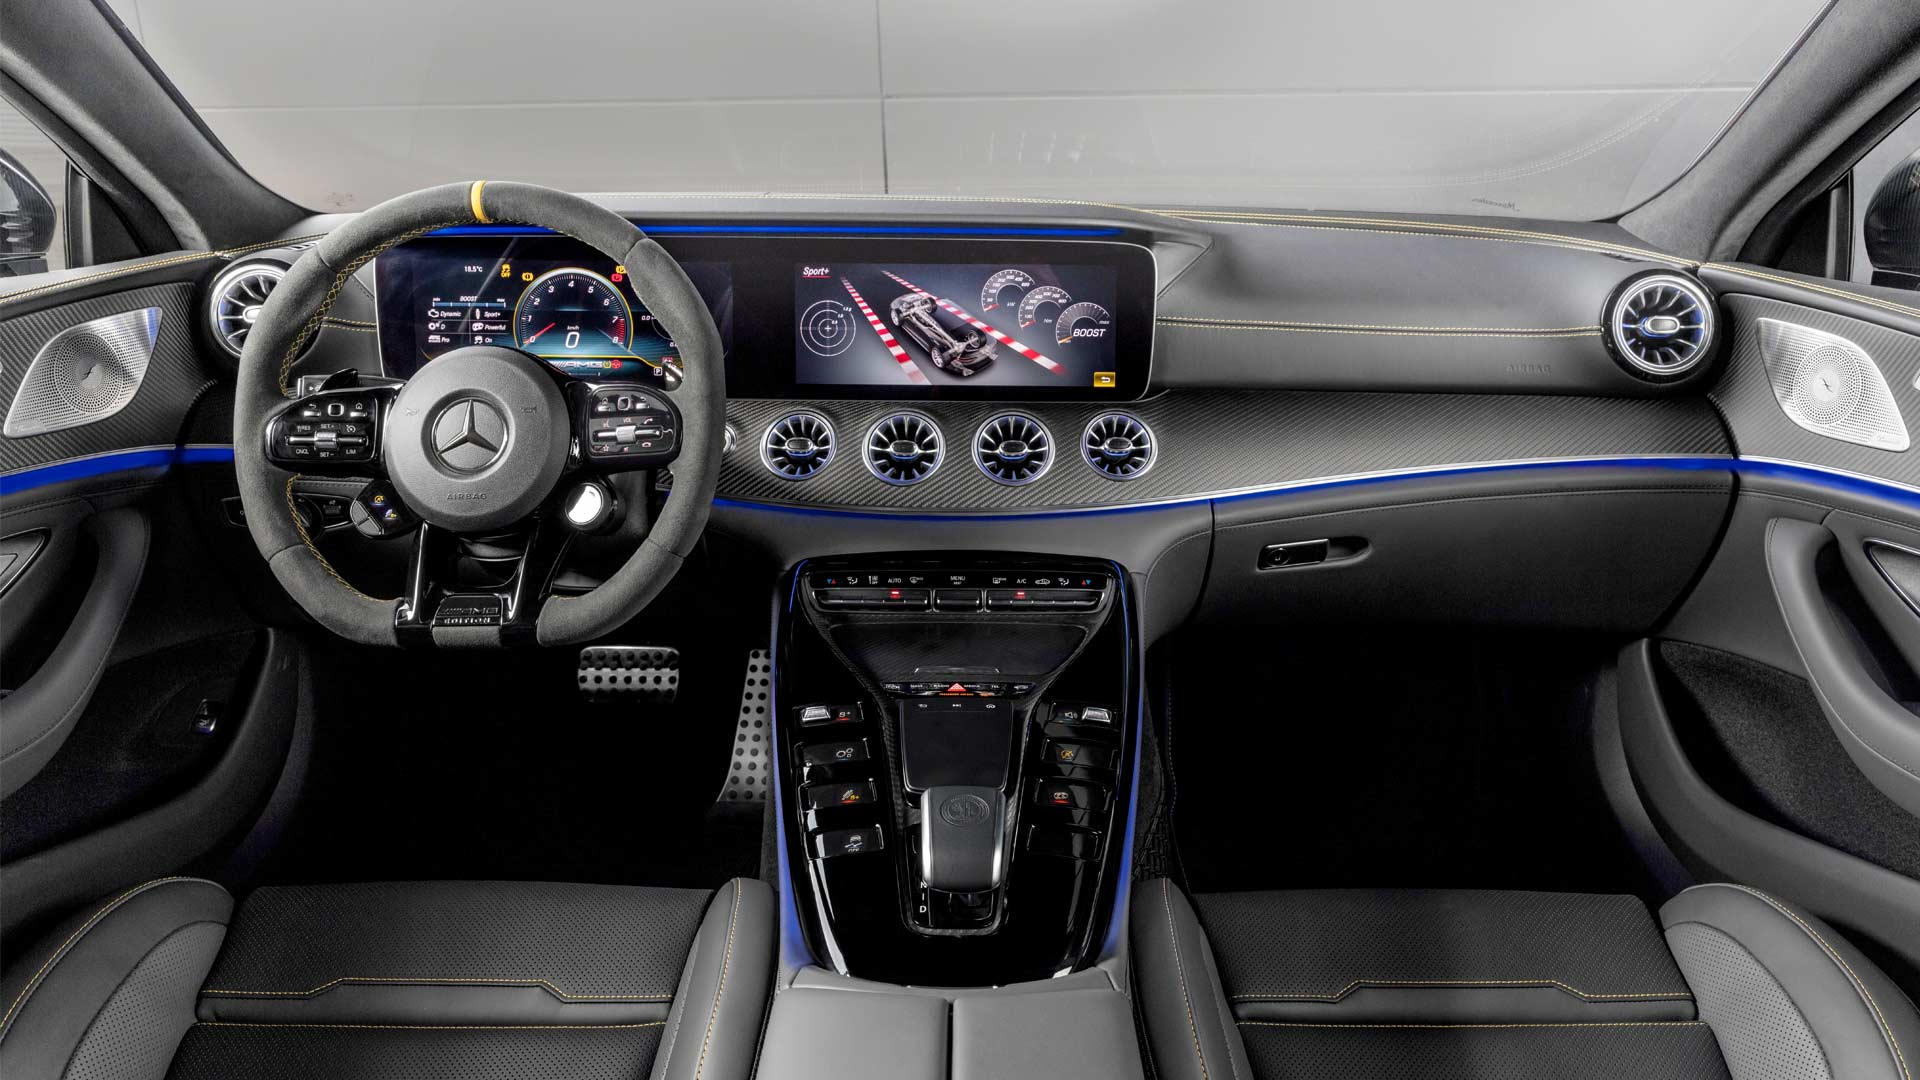 Mercedes-AMG-GT-4-Door-Coupé-Edition-1-interior_2